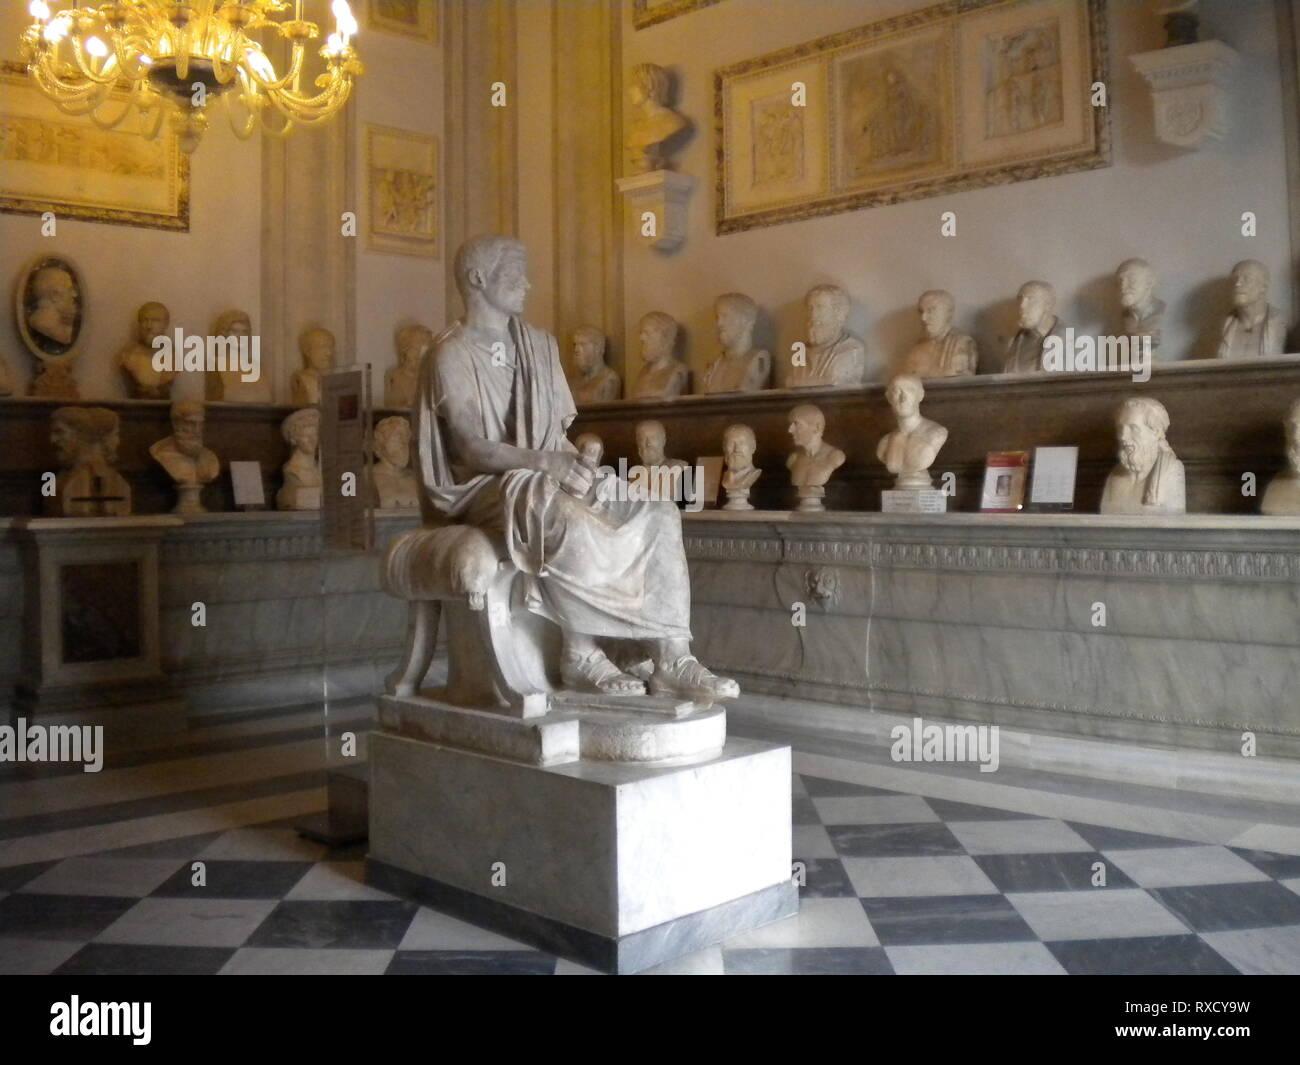 Salle des philosophes, Palazzo Nuovo, Musées Capitoline, Rome, Italie Banque D'Images